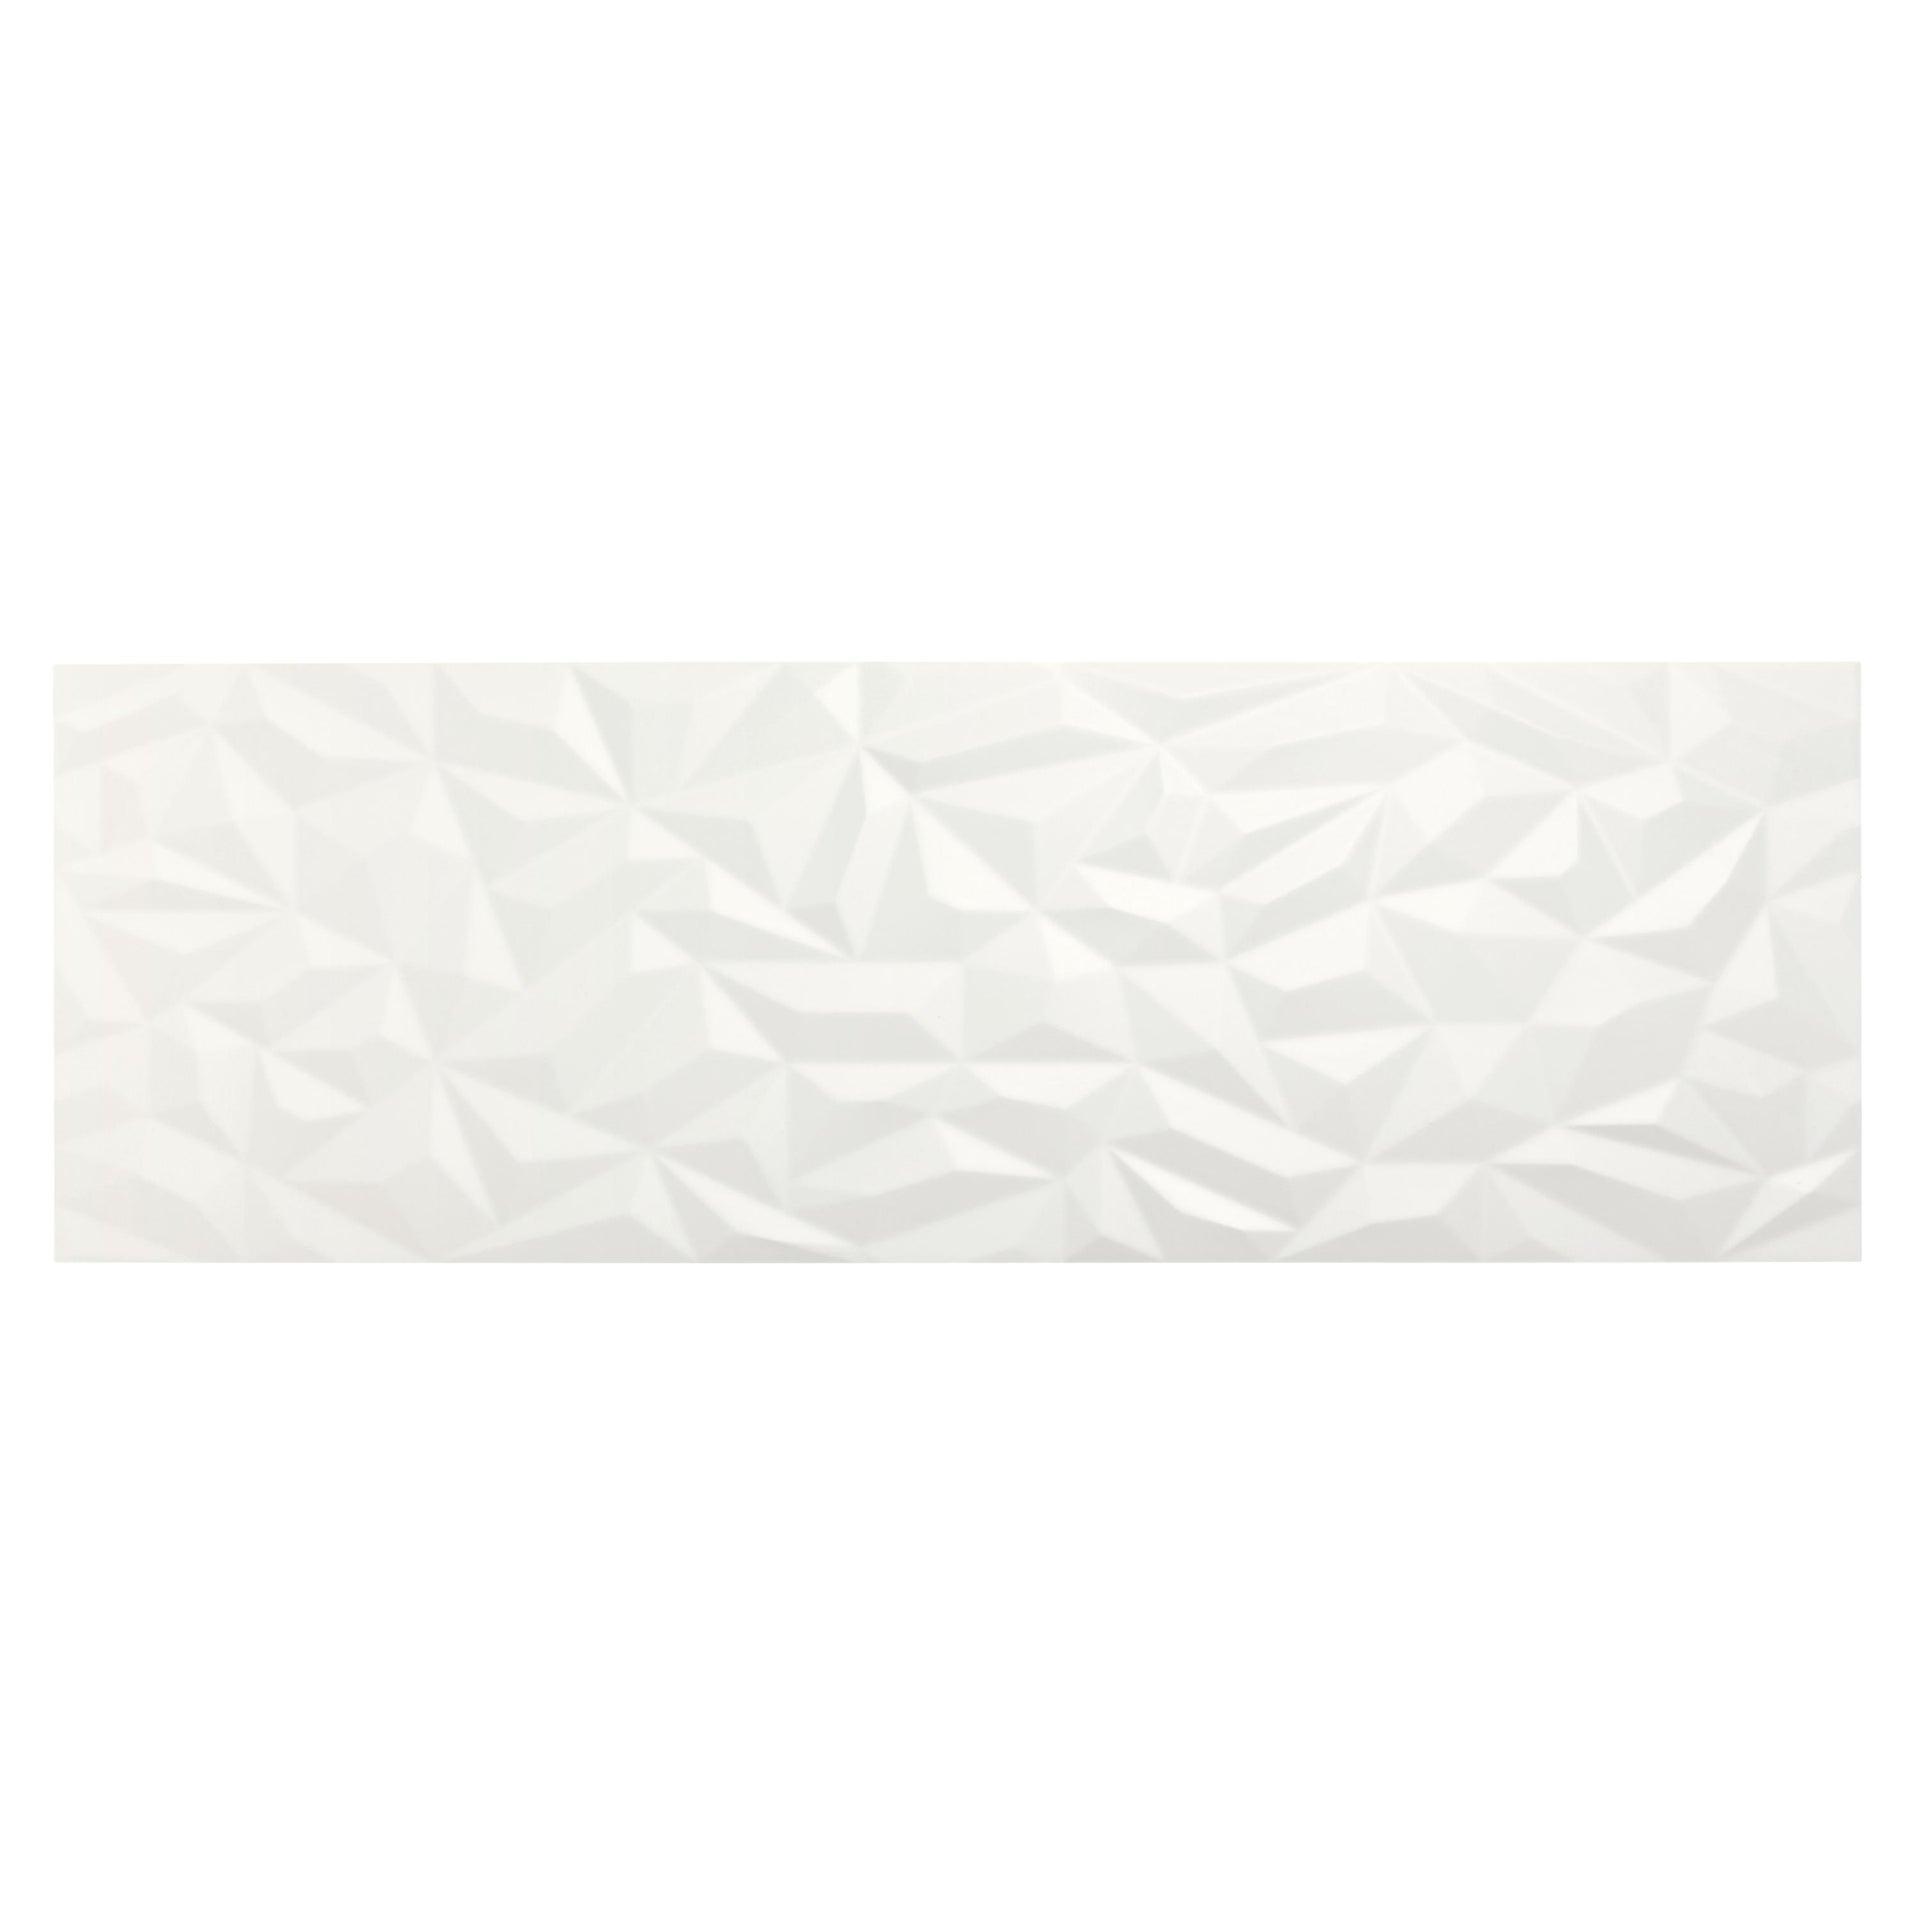 Piastrella per rivestimenti Arctic 30 x 90 cm sp. 10 mm bianco - 5